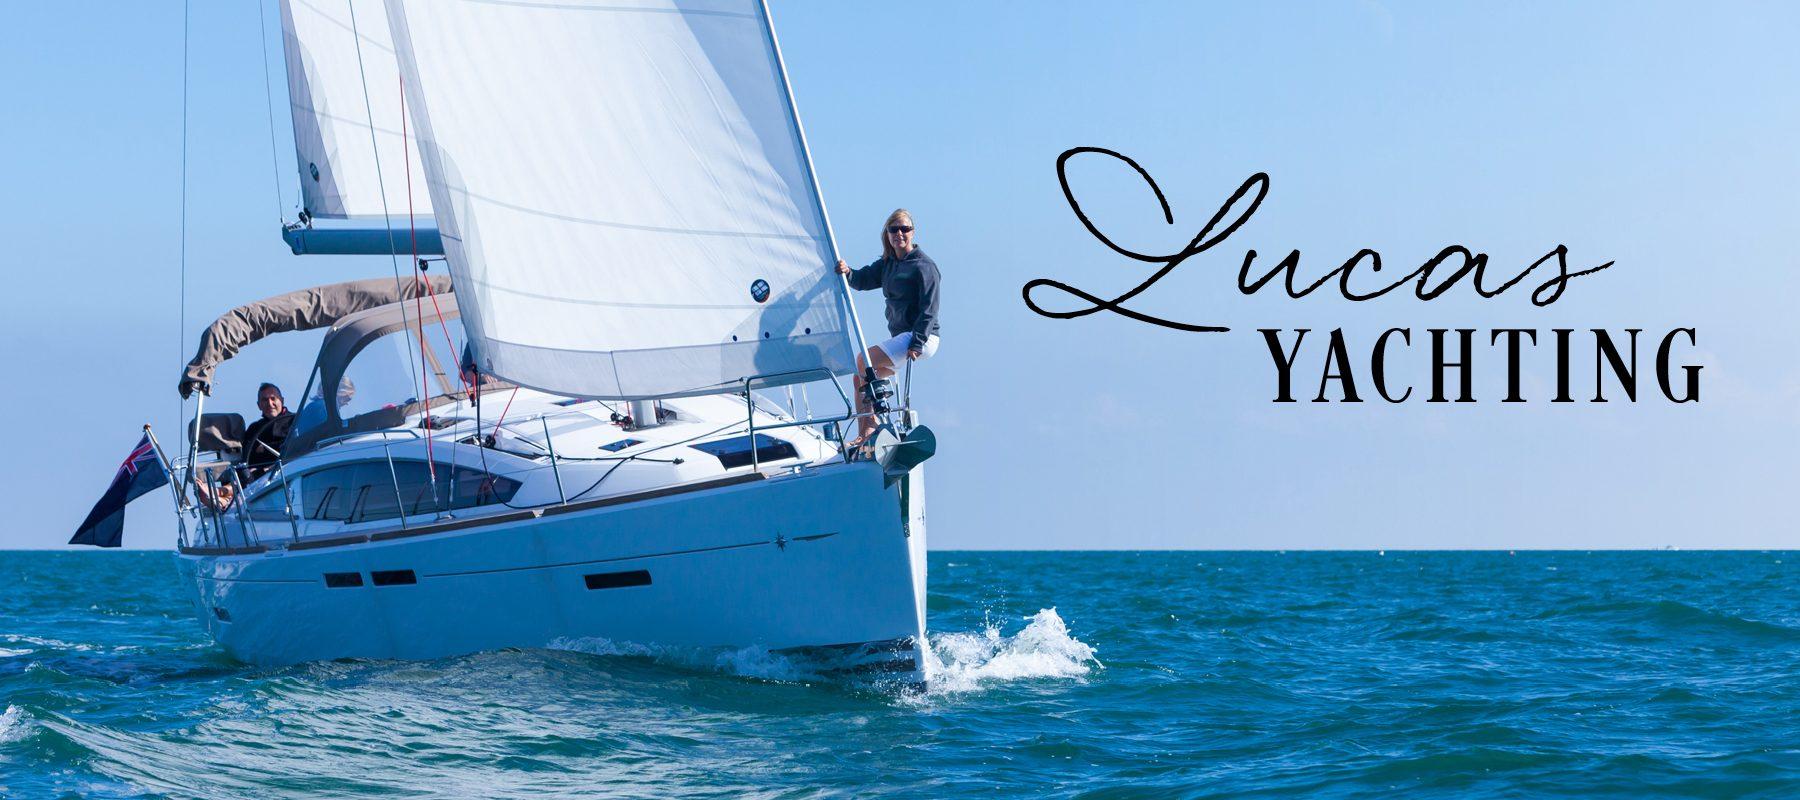 lucas yachting logo branding torquay brokerage web design